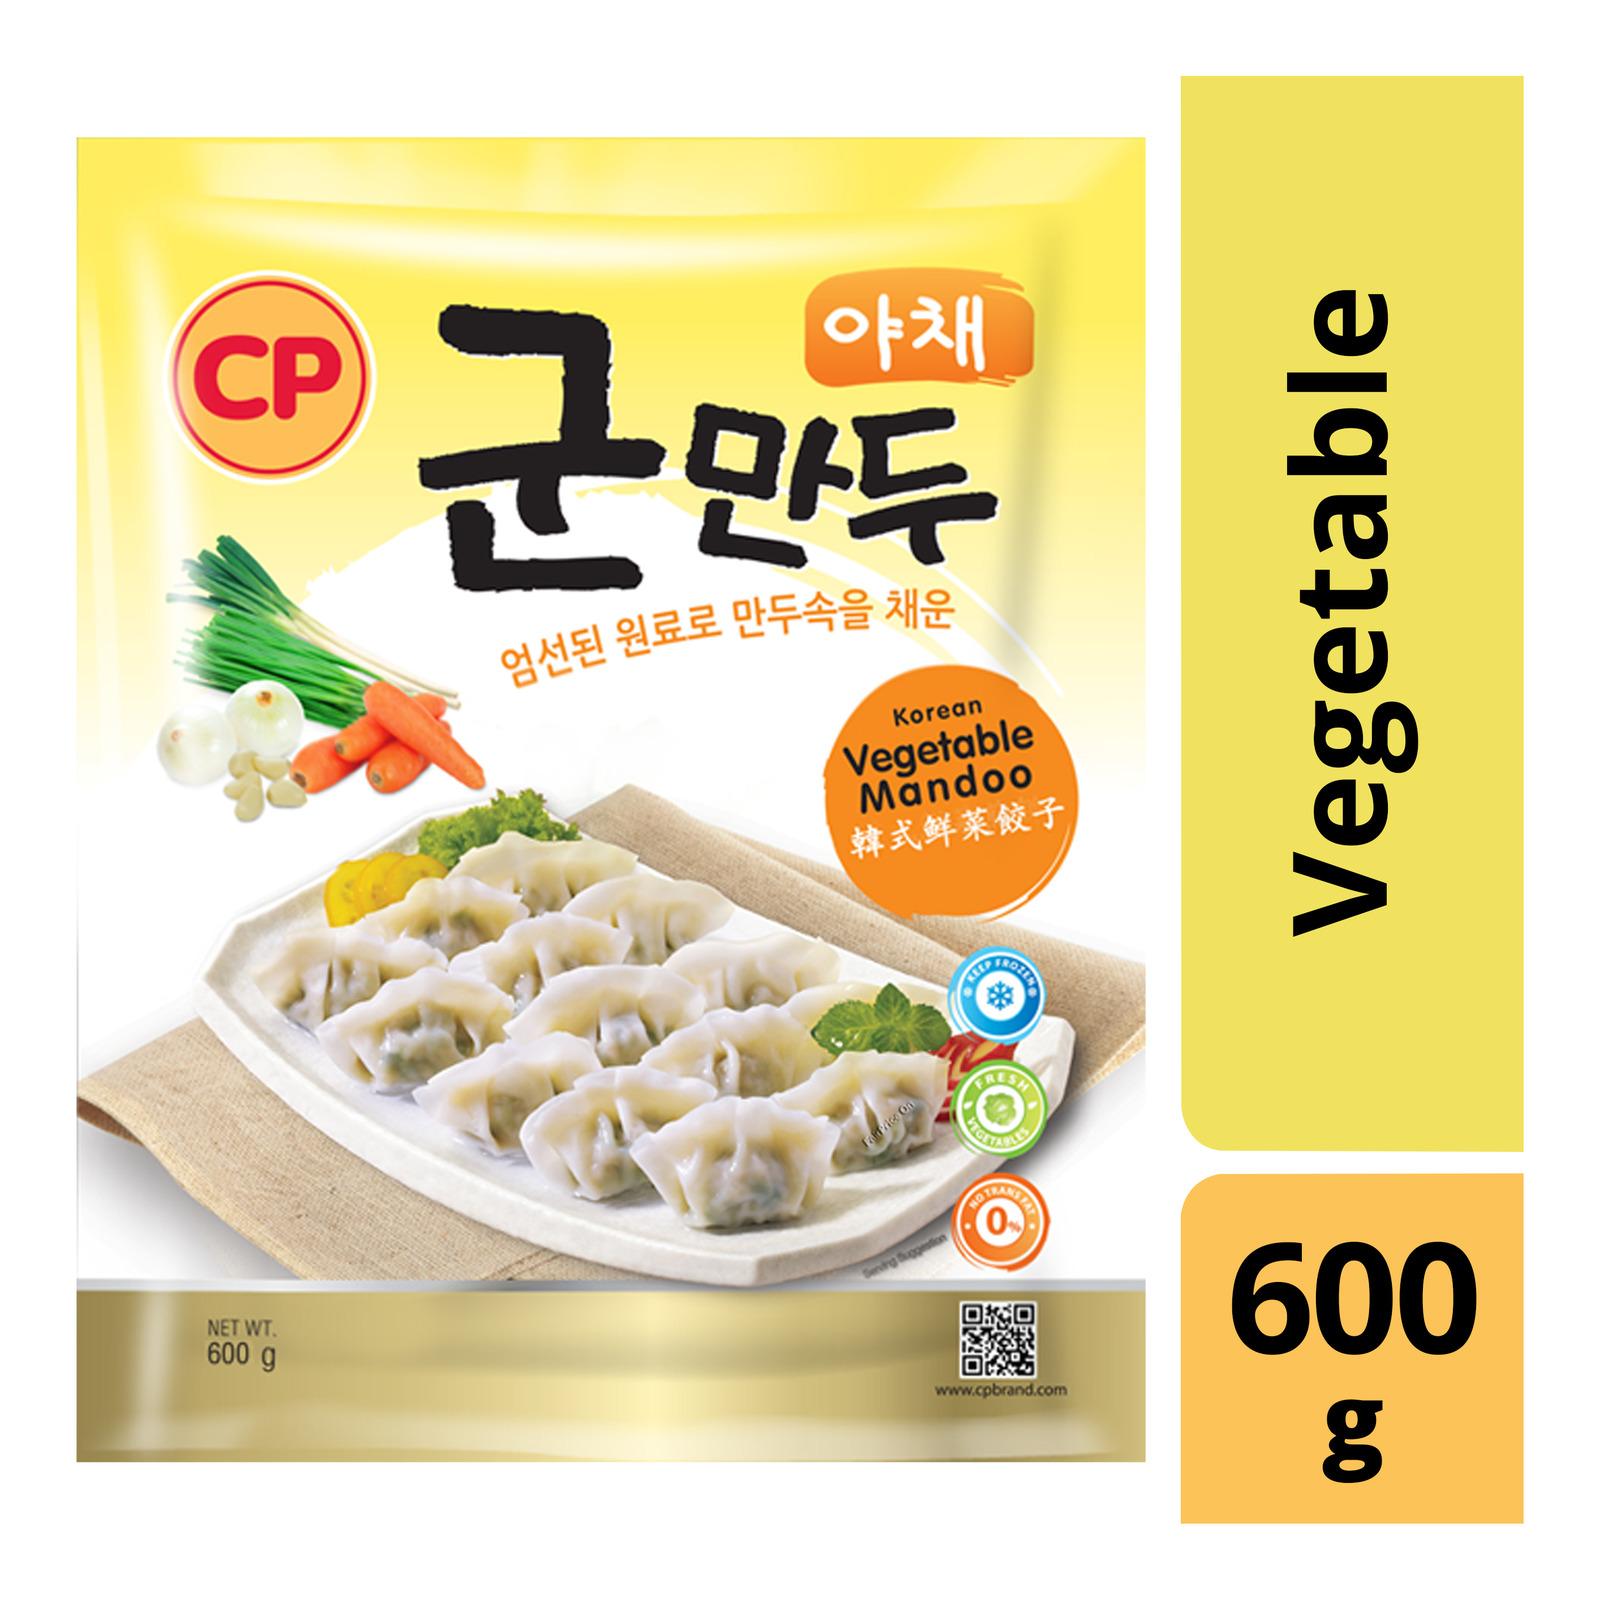 CP Korean Mandoo (Dumpling) - Vegetable